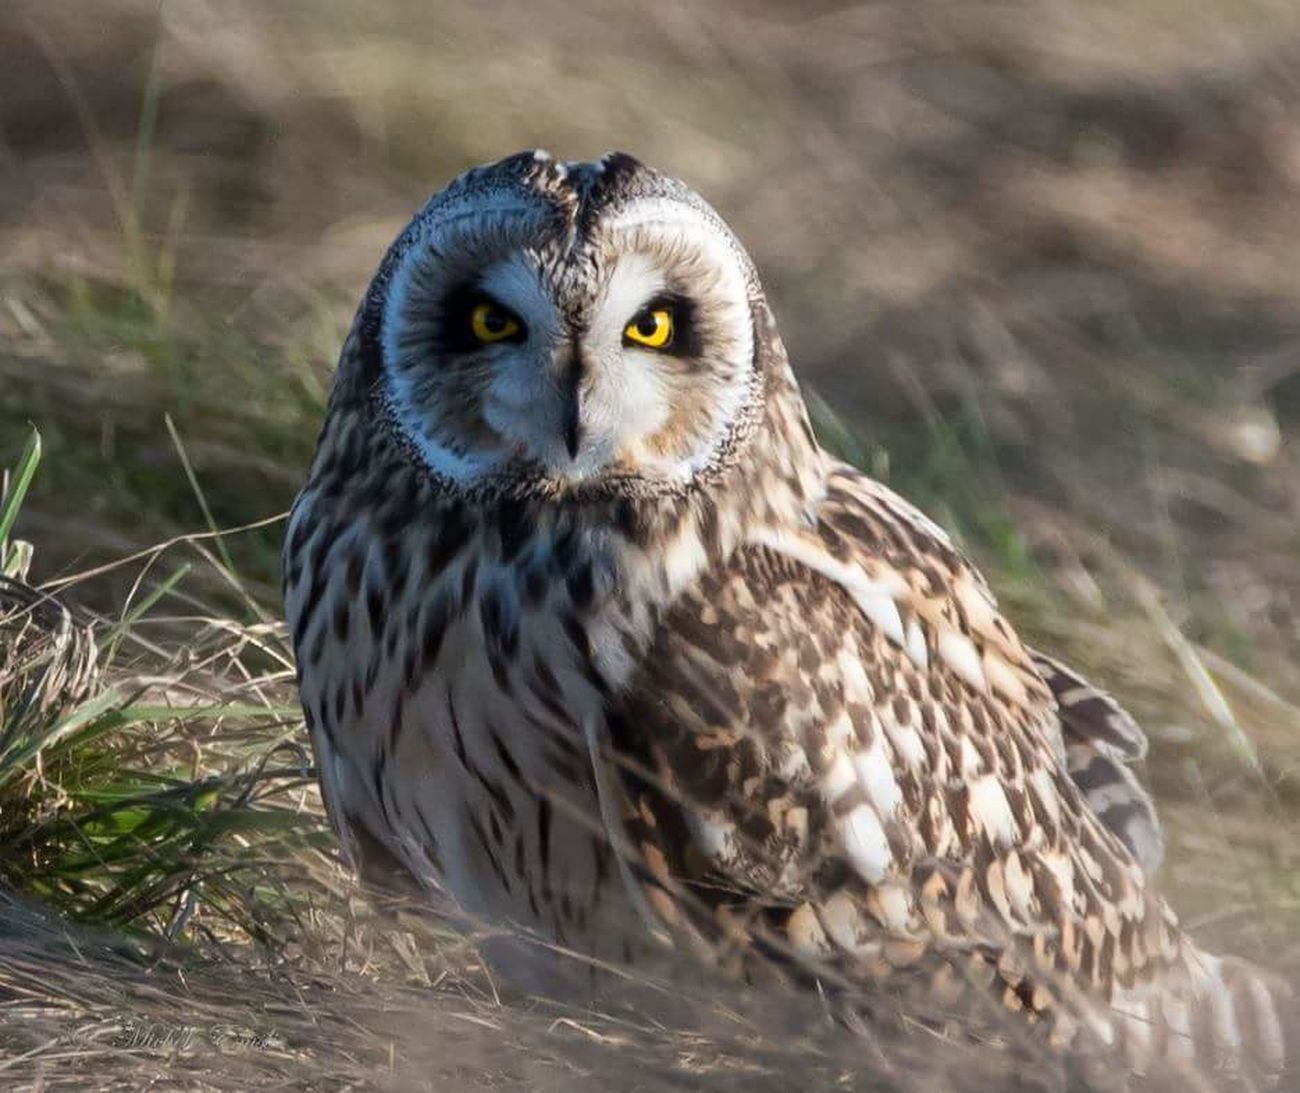 Watching you, watching me.... Short Eared Owl Owl Eyes Owls💕 Birds Of EyeEm  Birdsofinstagram Bird Photography Bird Of Prey Wildlife Wildlife Photography Nikon Aberdeen,Scotland